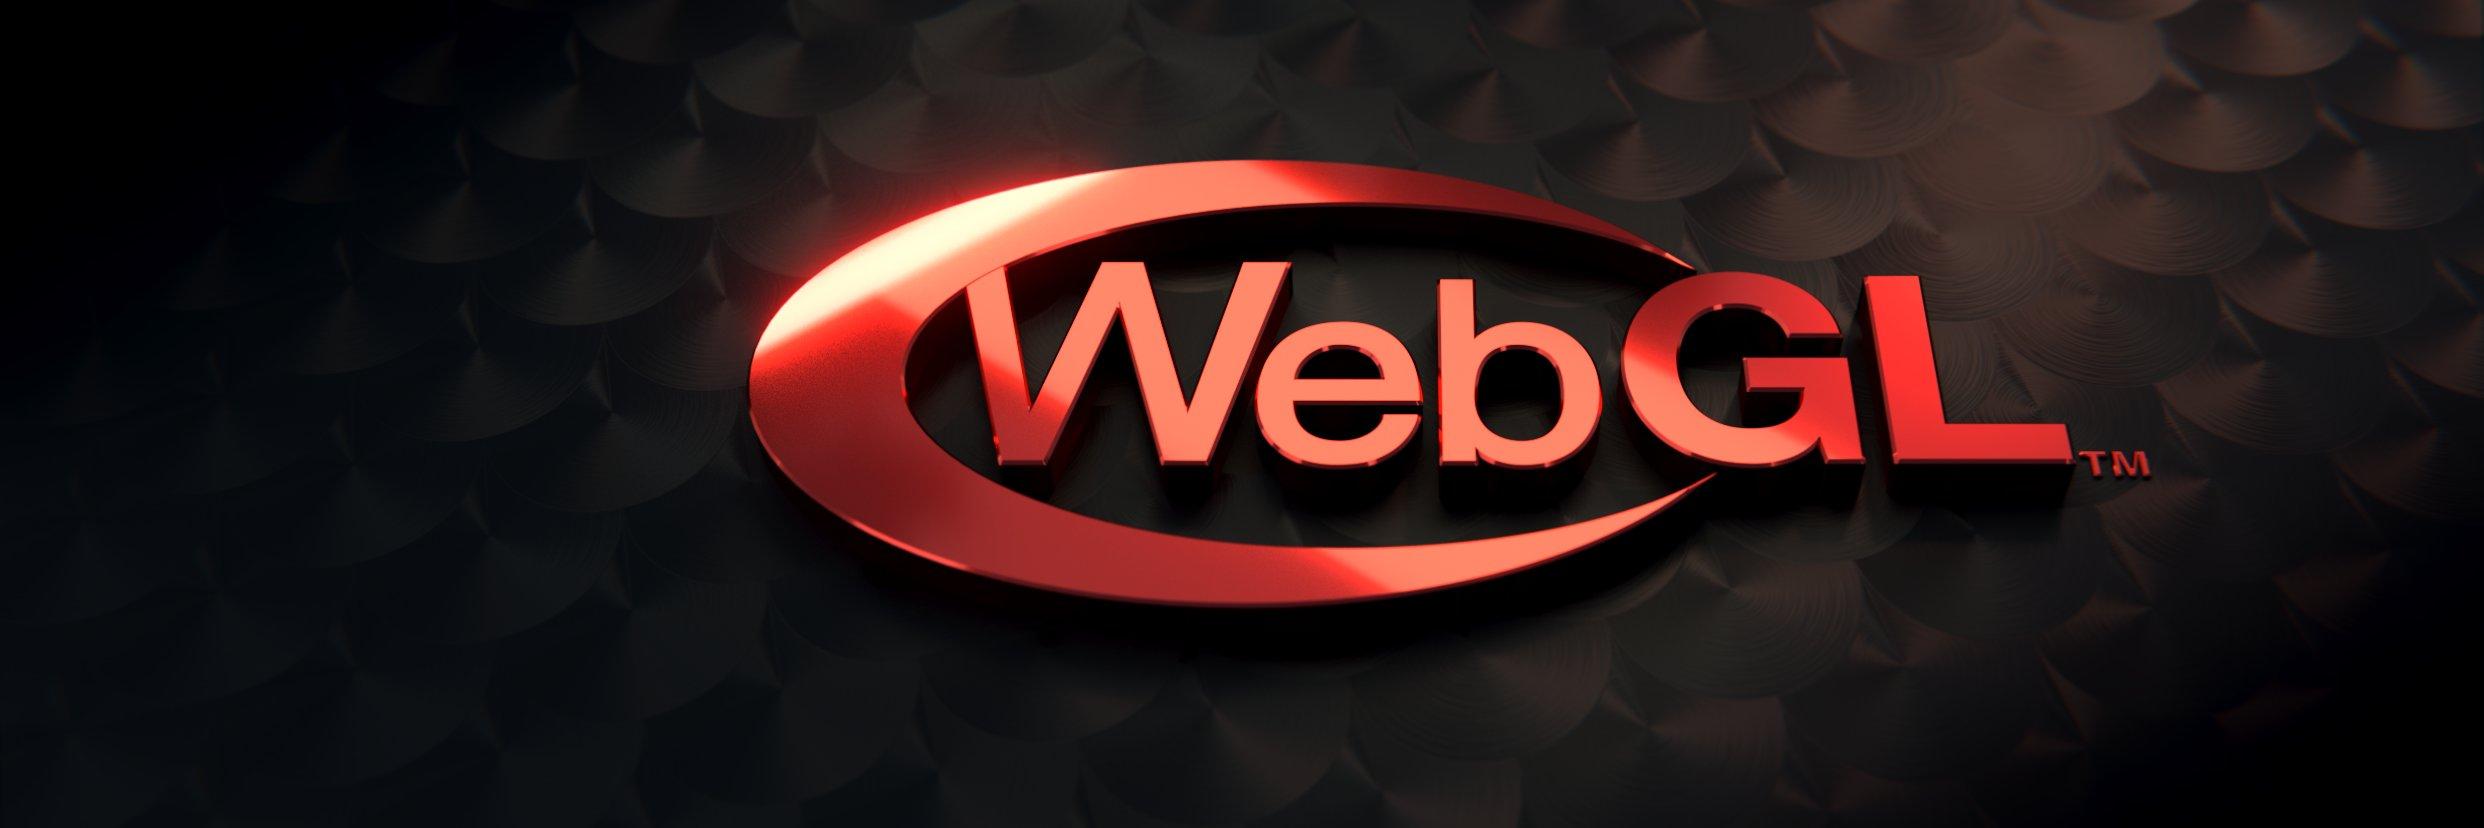 WebGL 2.0 Specification Finalized and Shipping – Work on Next Generation WebGL Underway! khronos.org/blog/webgl-2.0…